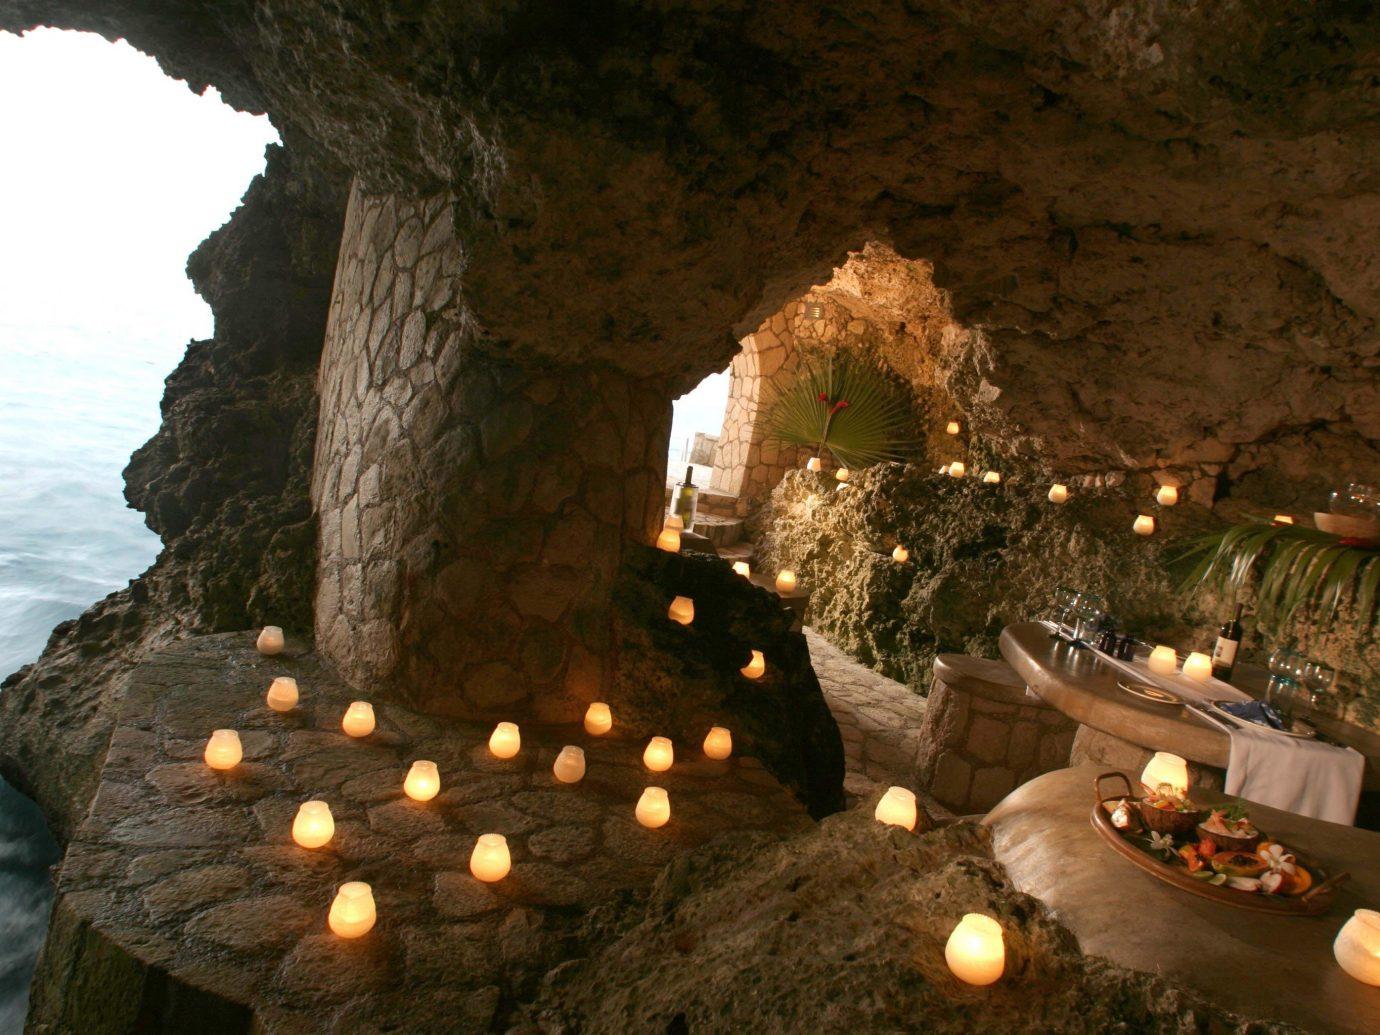 Hotels outdoor cave Nature screenshot formation terrain